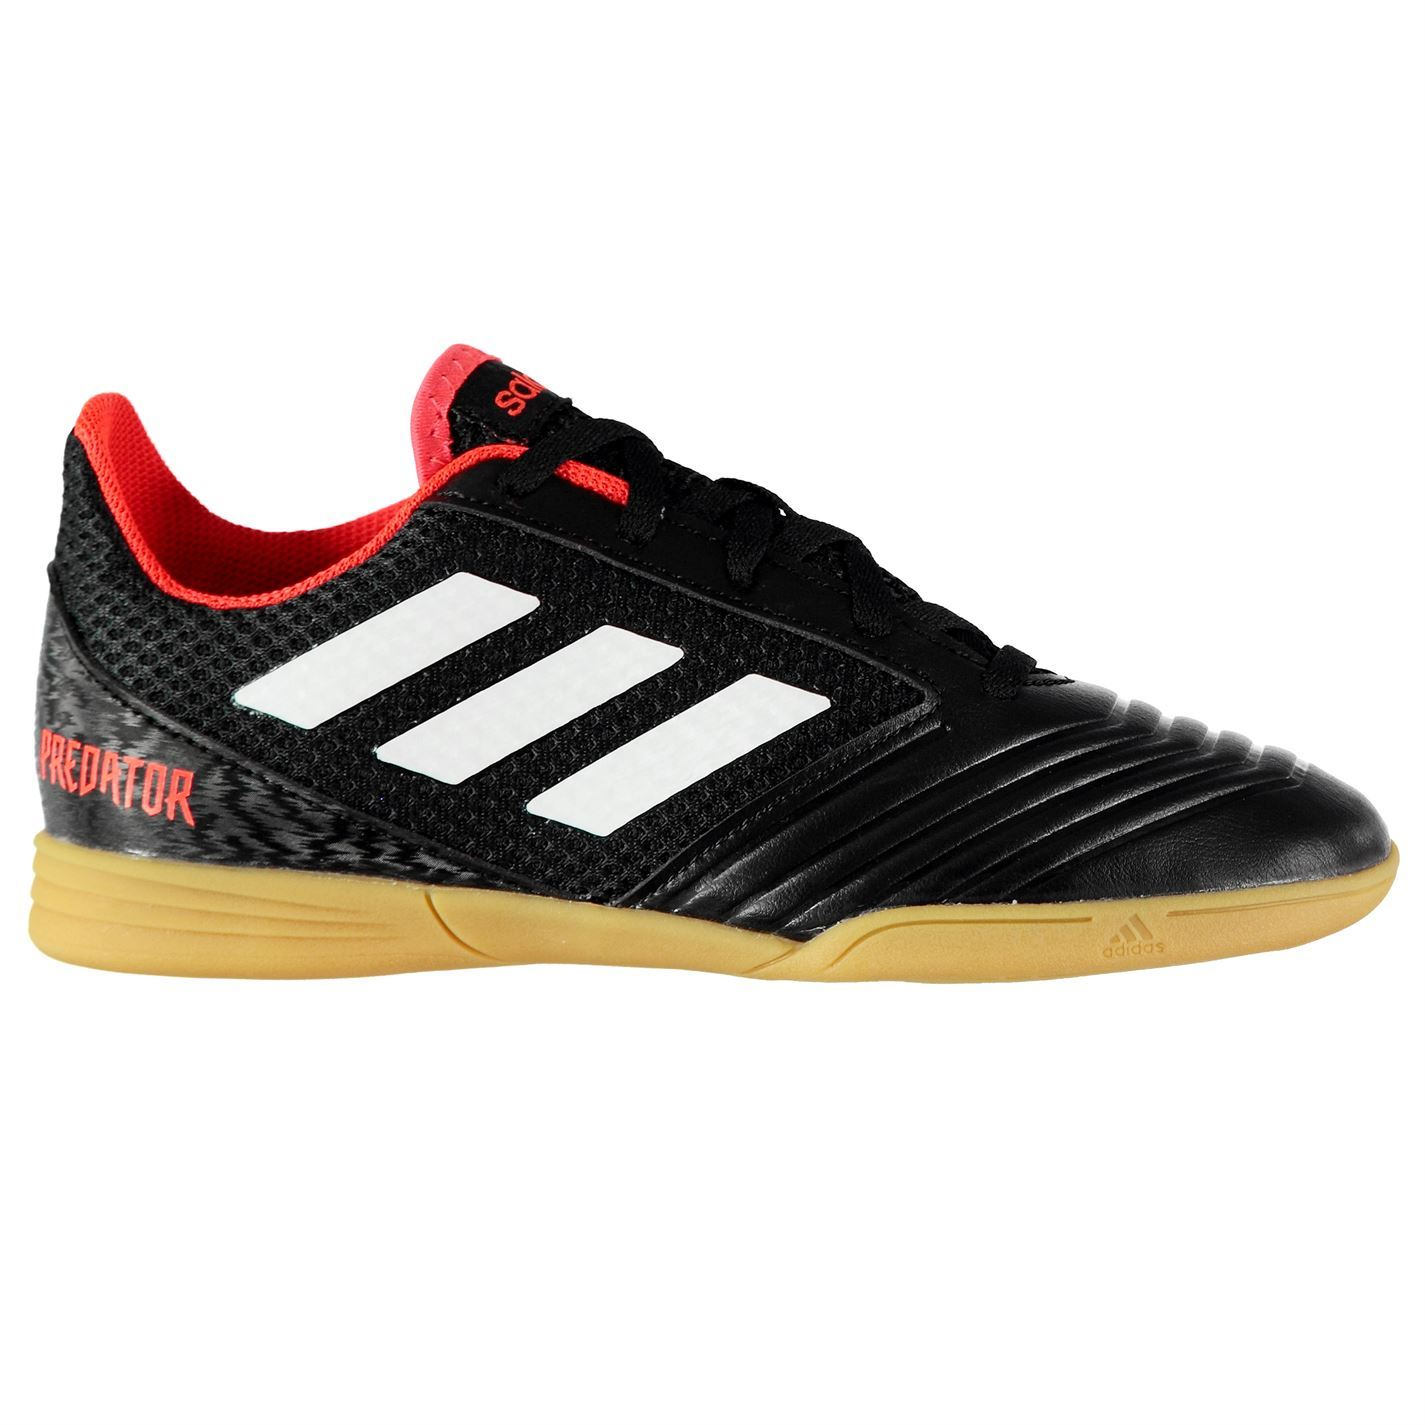 1ab8cefa44cb ... shopping adidas predator laces 92f2f 66d5e